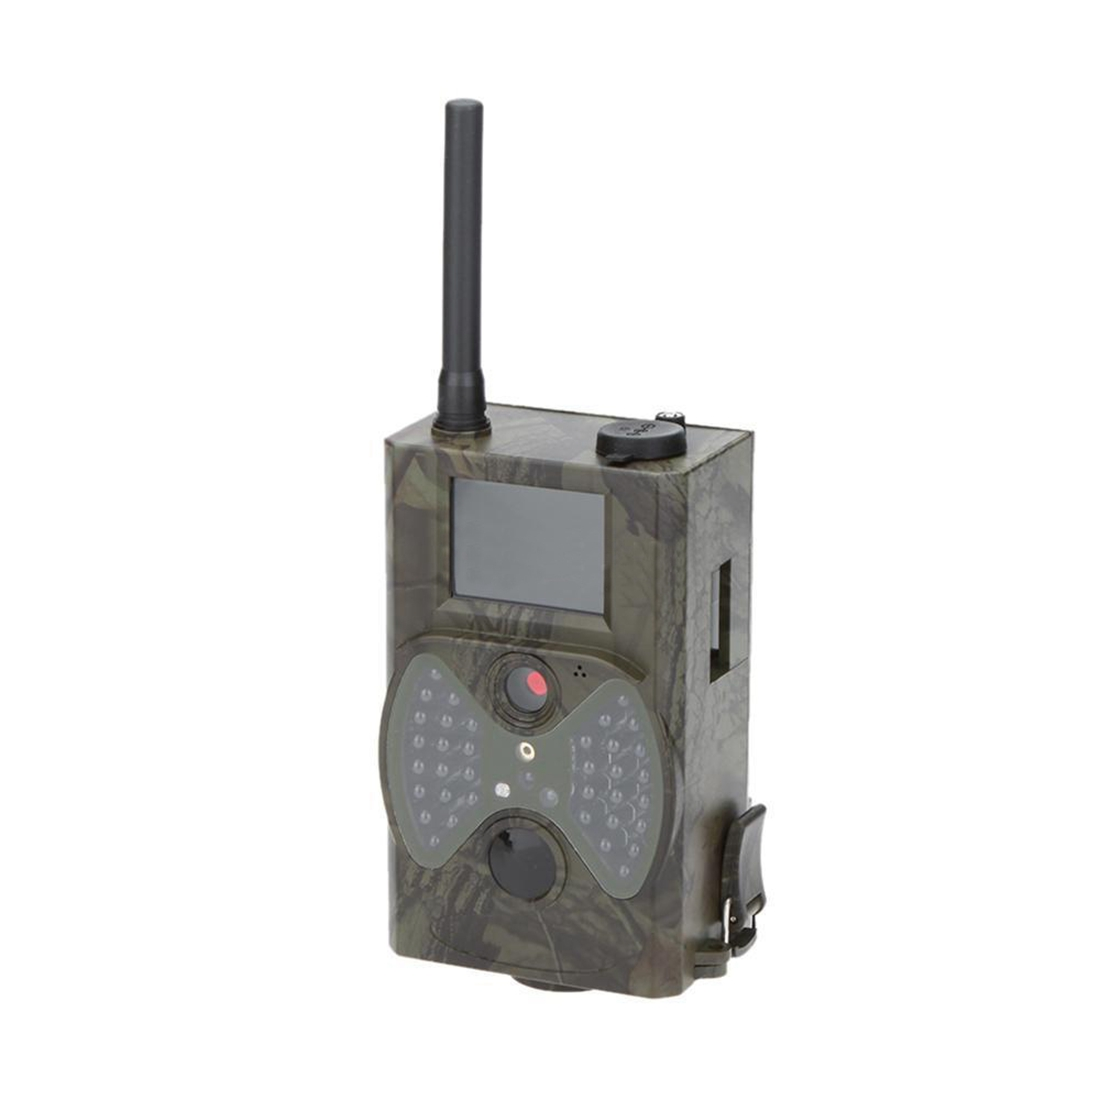 940NM Scouting Hunting Camera HC300M GPRS MMS Infrared Trail GSM IR LED J6F0 arduino atmega328p gboard 800 direct factory gsm gprs sim800 quad band development board 7v 23v with gsm gprs bt module